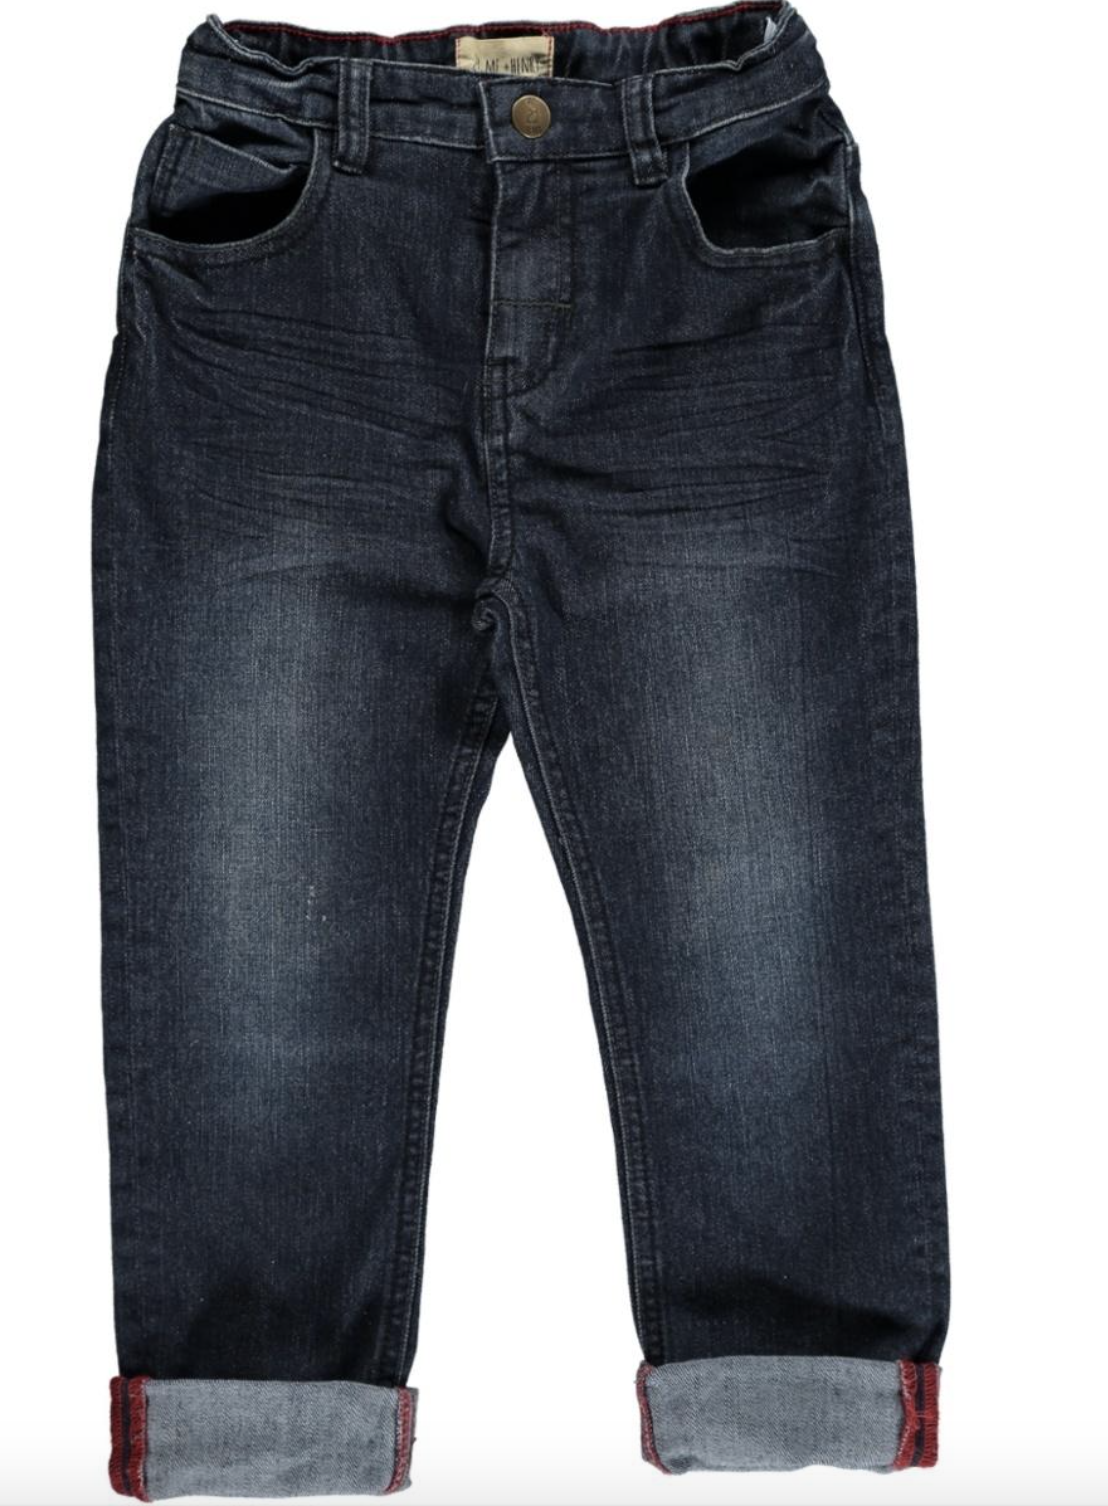 Me + Henry Navy Slim Fit Denim Jeans, Boys